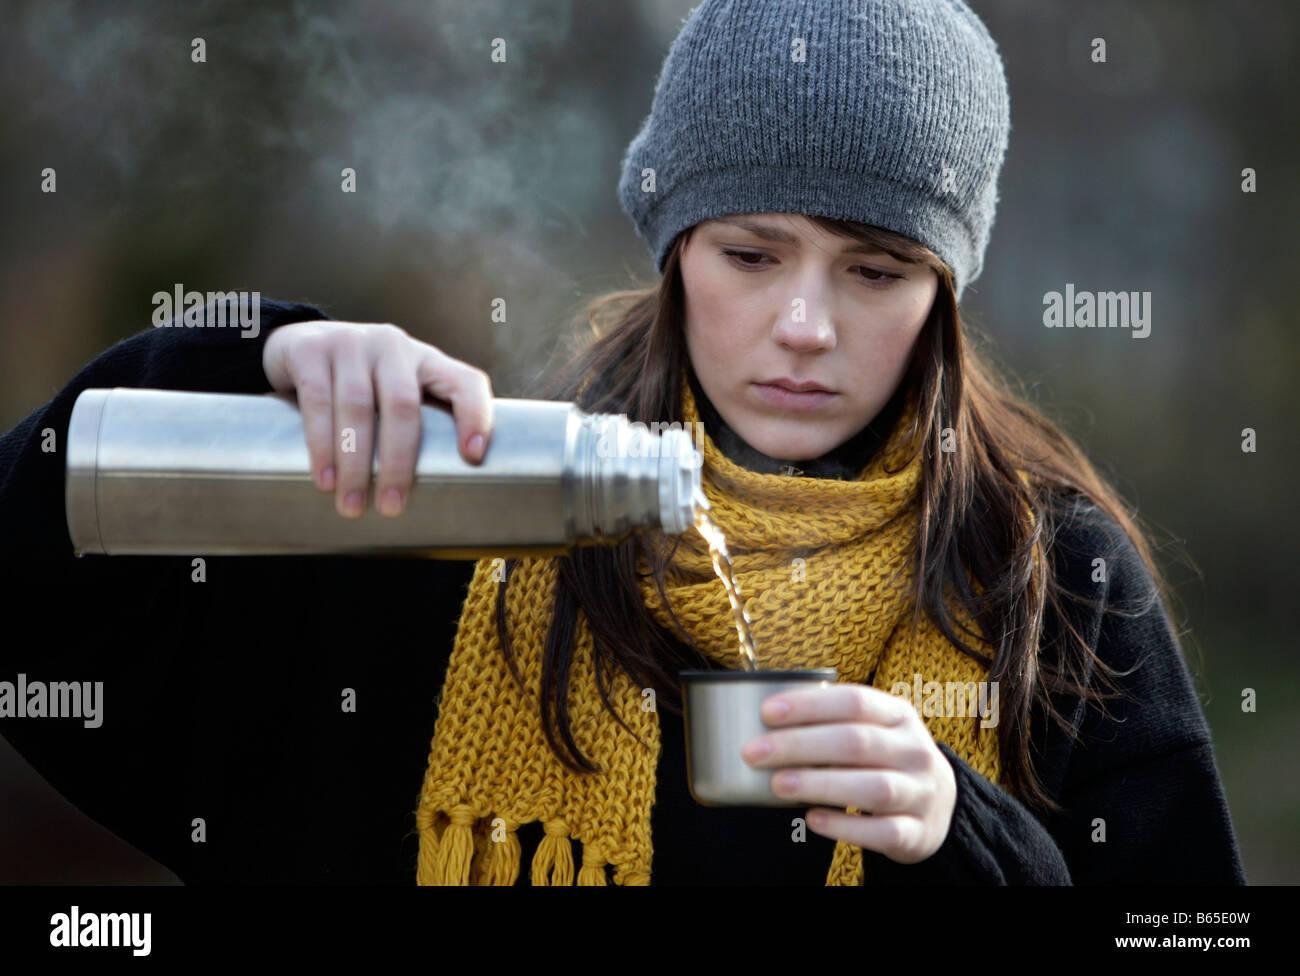 Young Girl drinking Tea - Stock Image